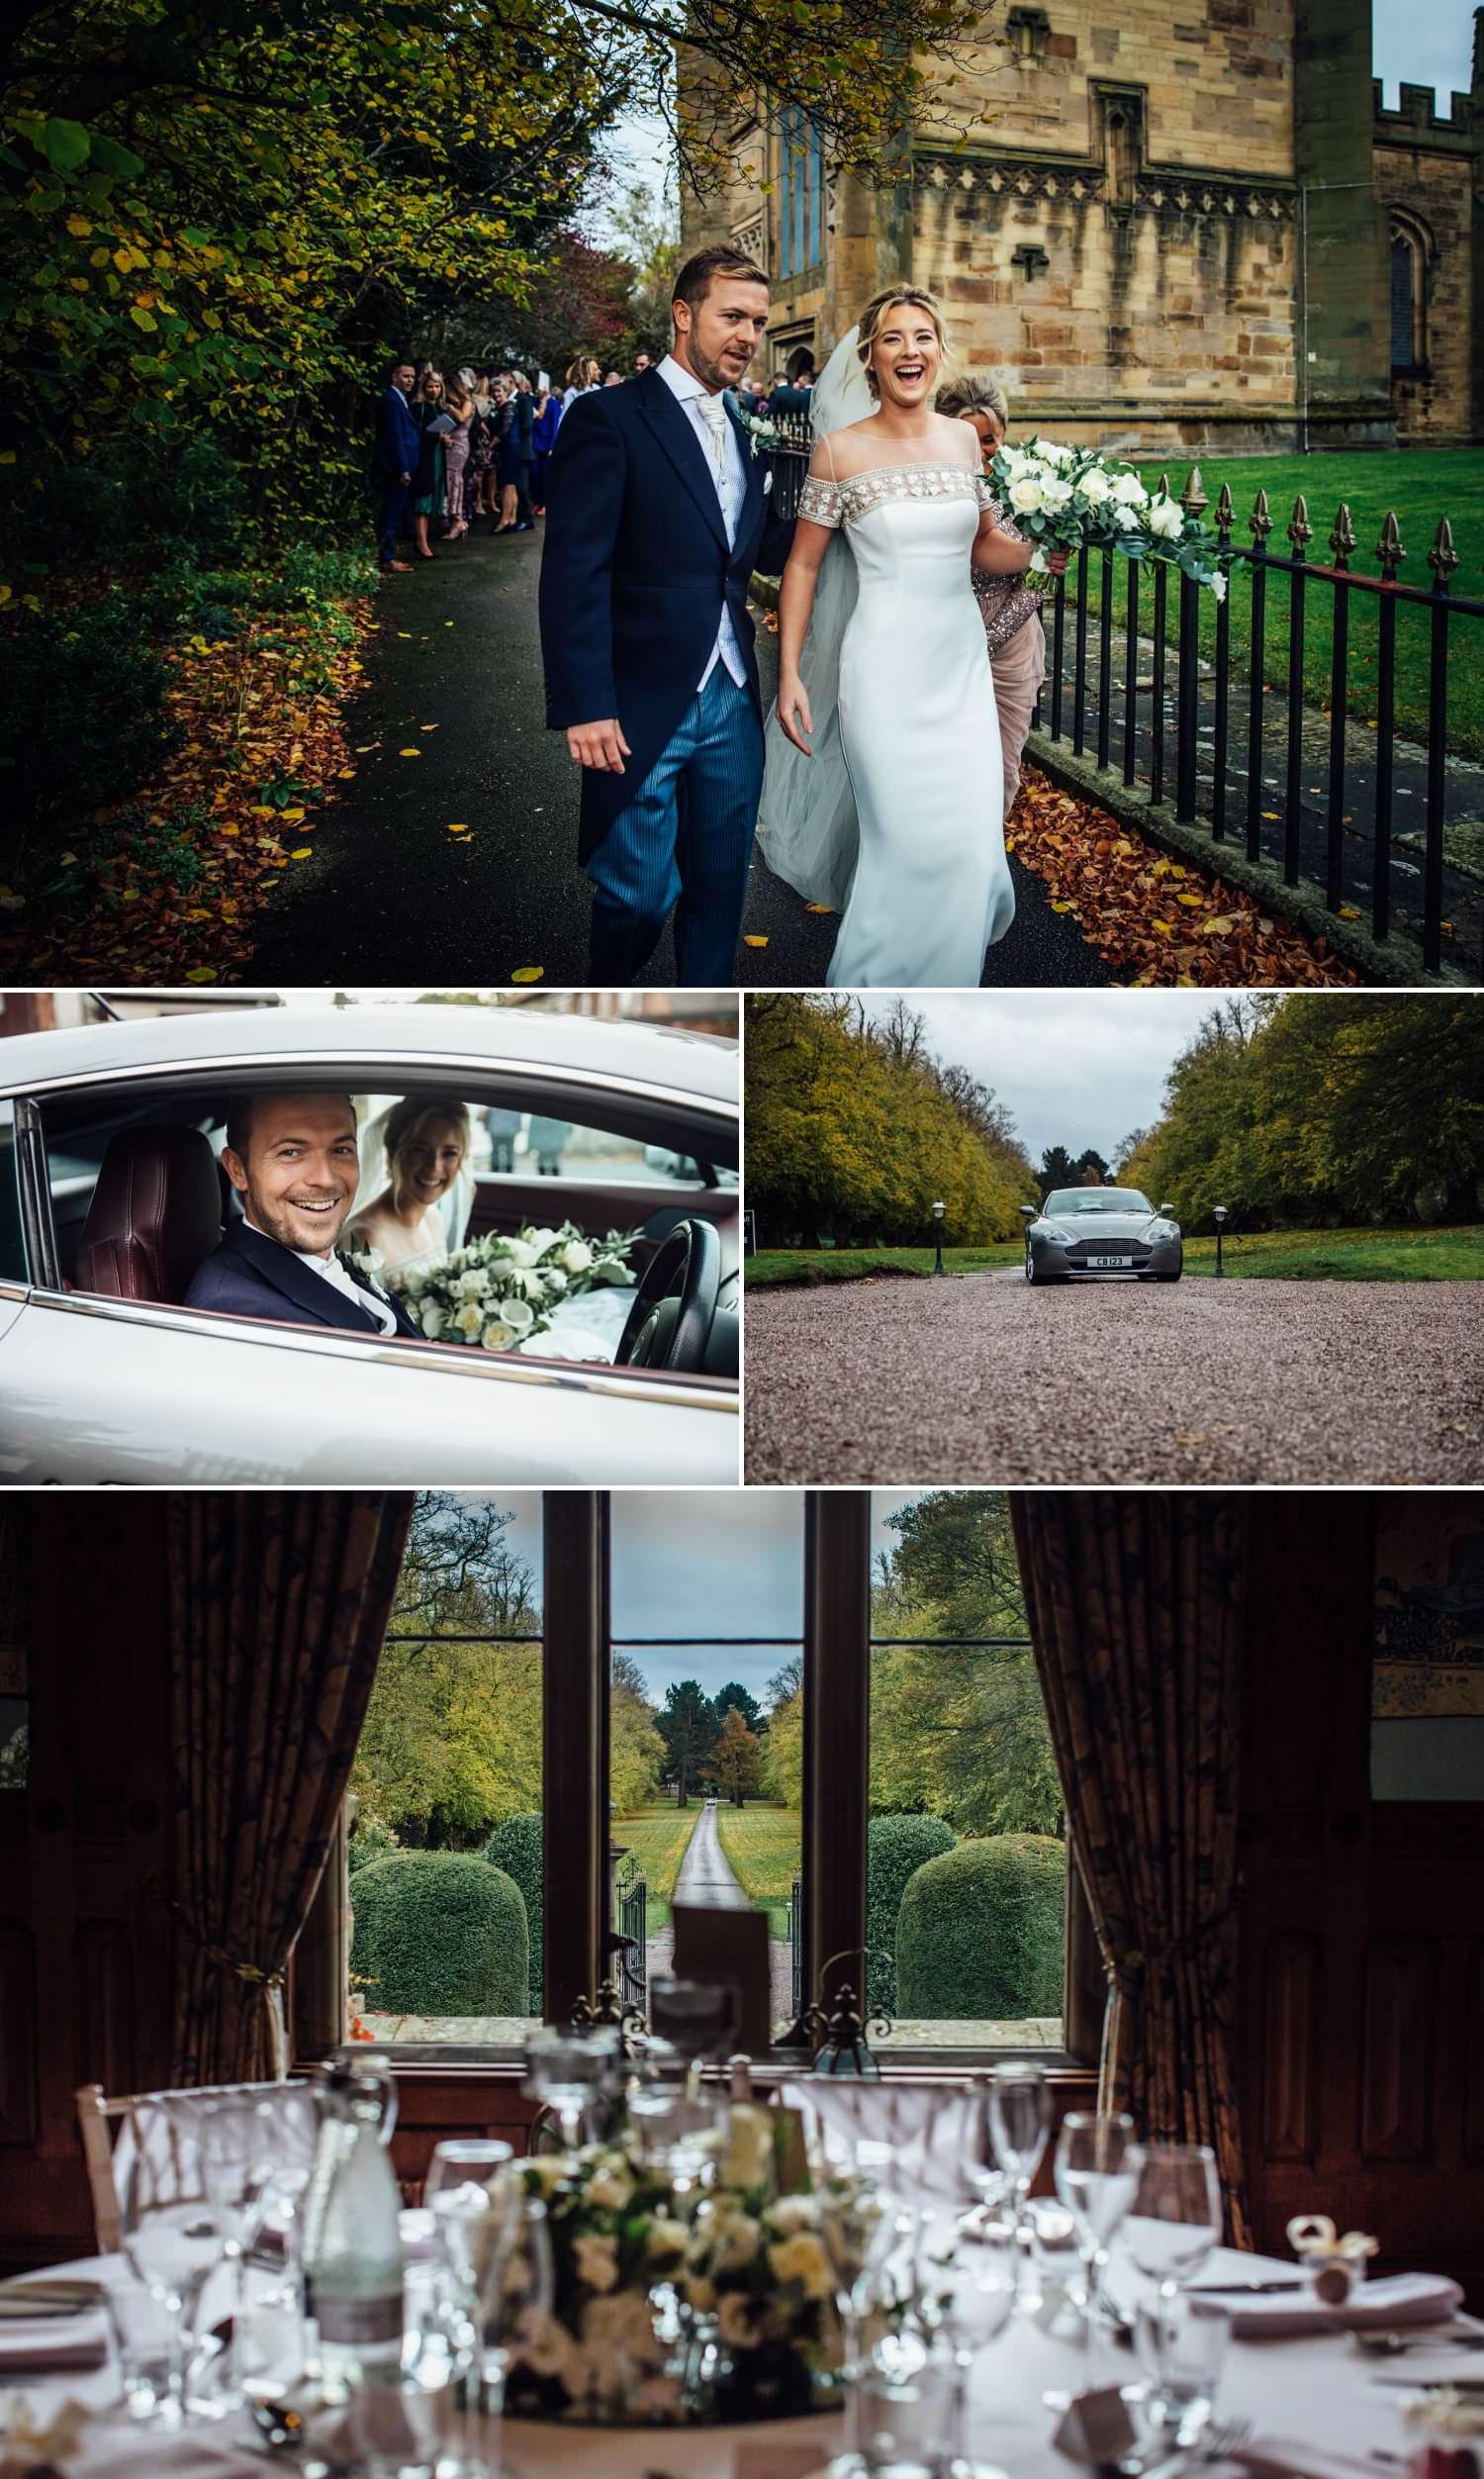 Wedding photography at Northop church